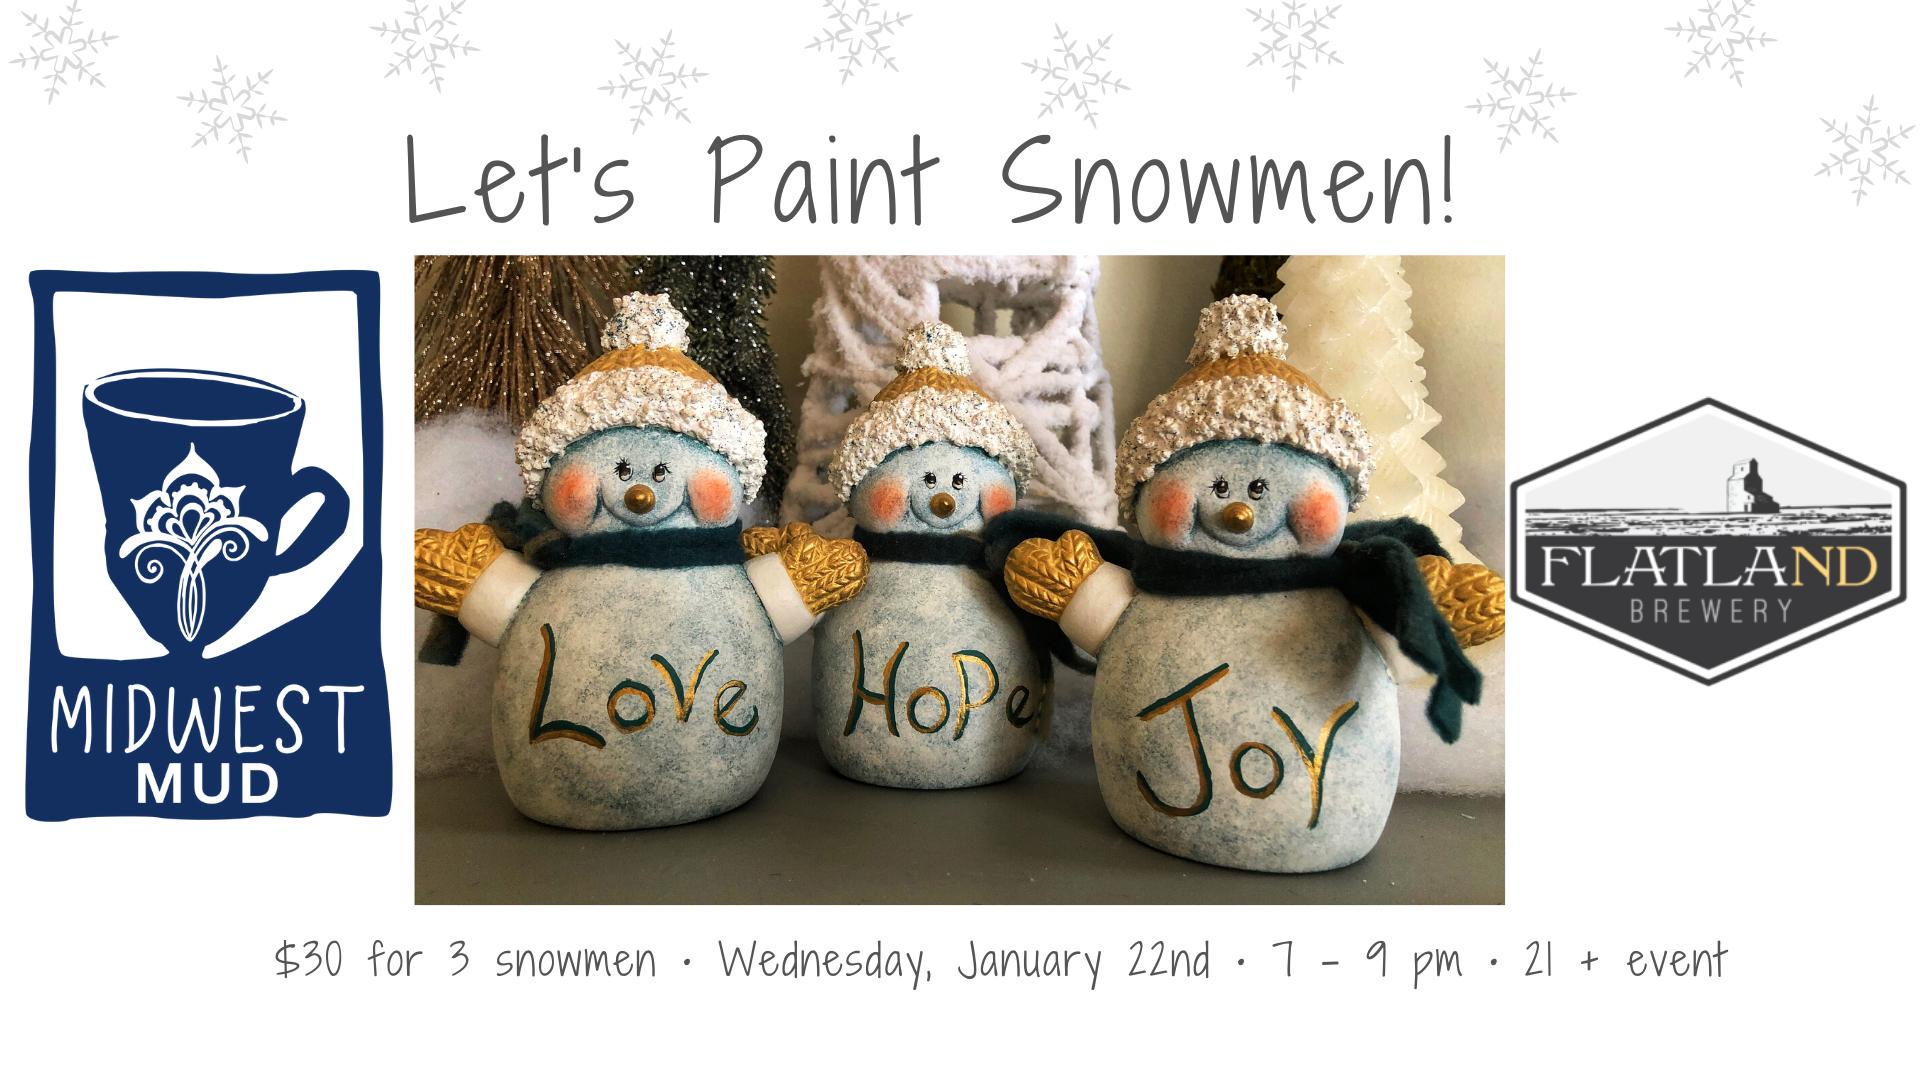 Let's Paint Snowmen @ Flatland Brewery!